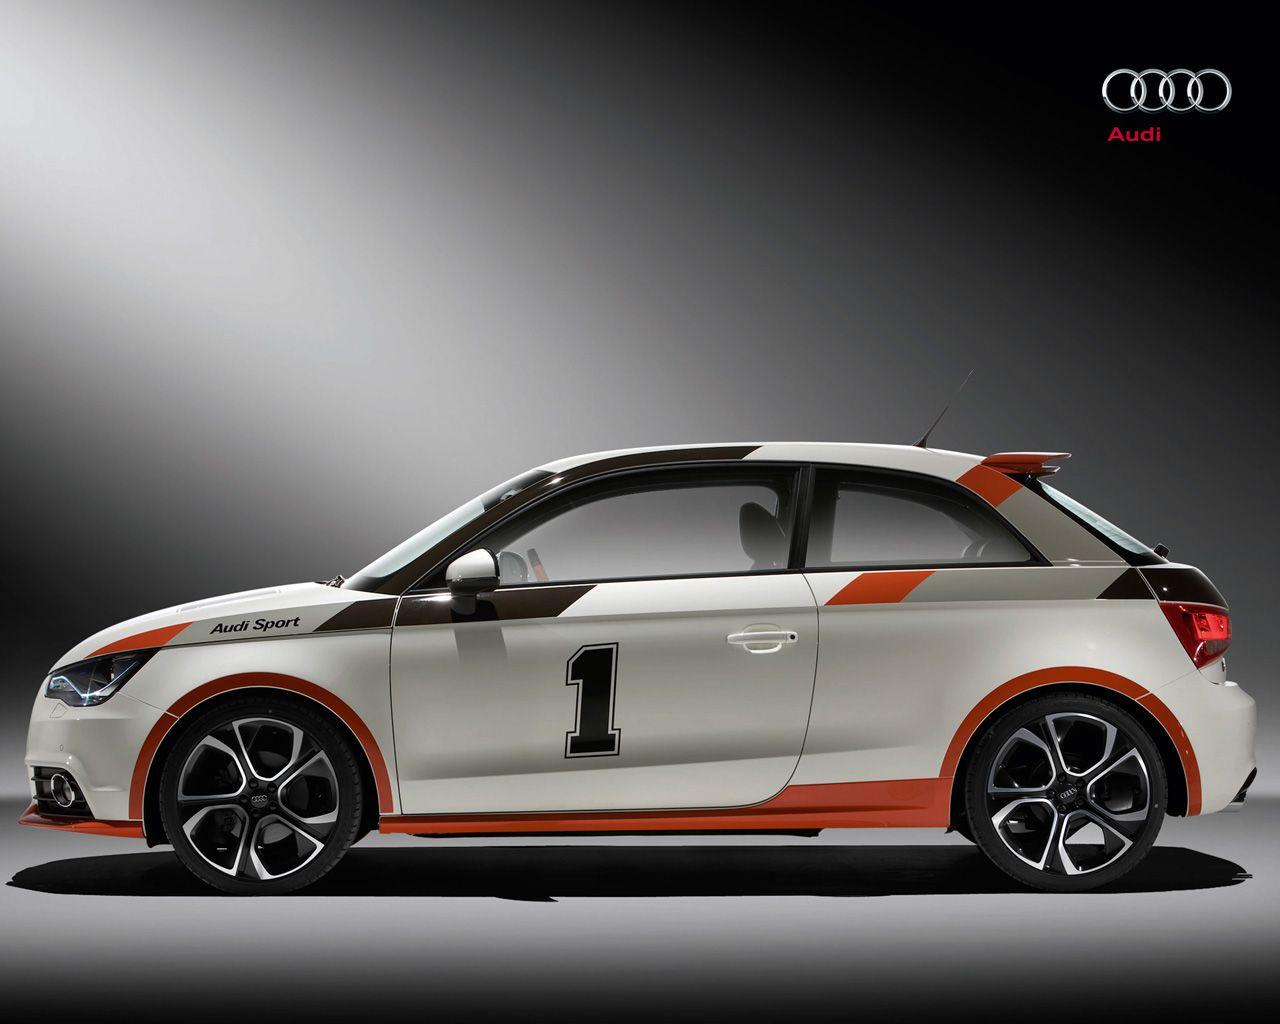 Audi A1 Competition Kit Car Wrap Design Mazda Mx5 Miata Car